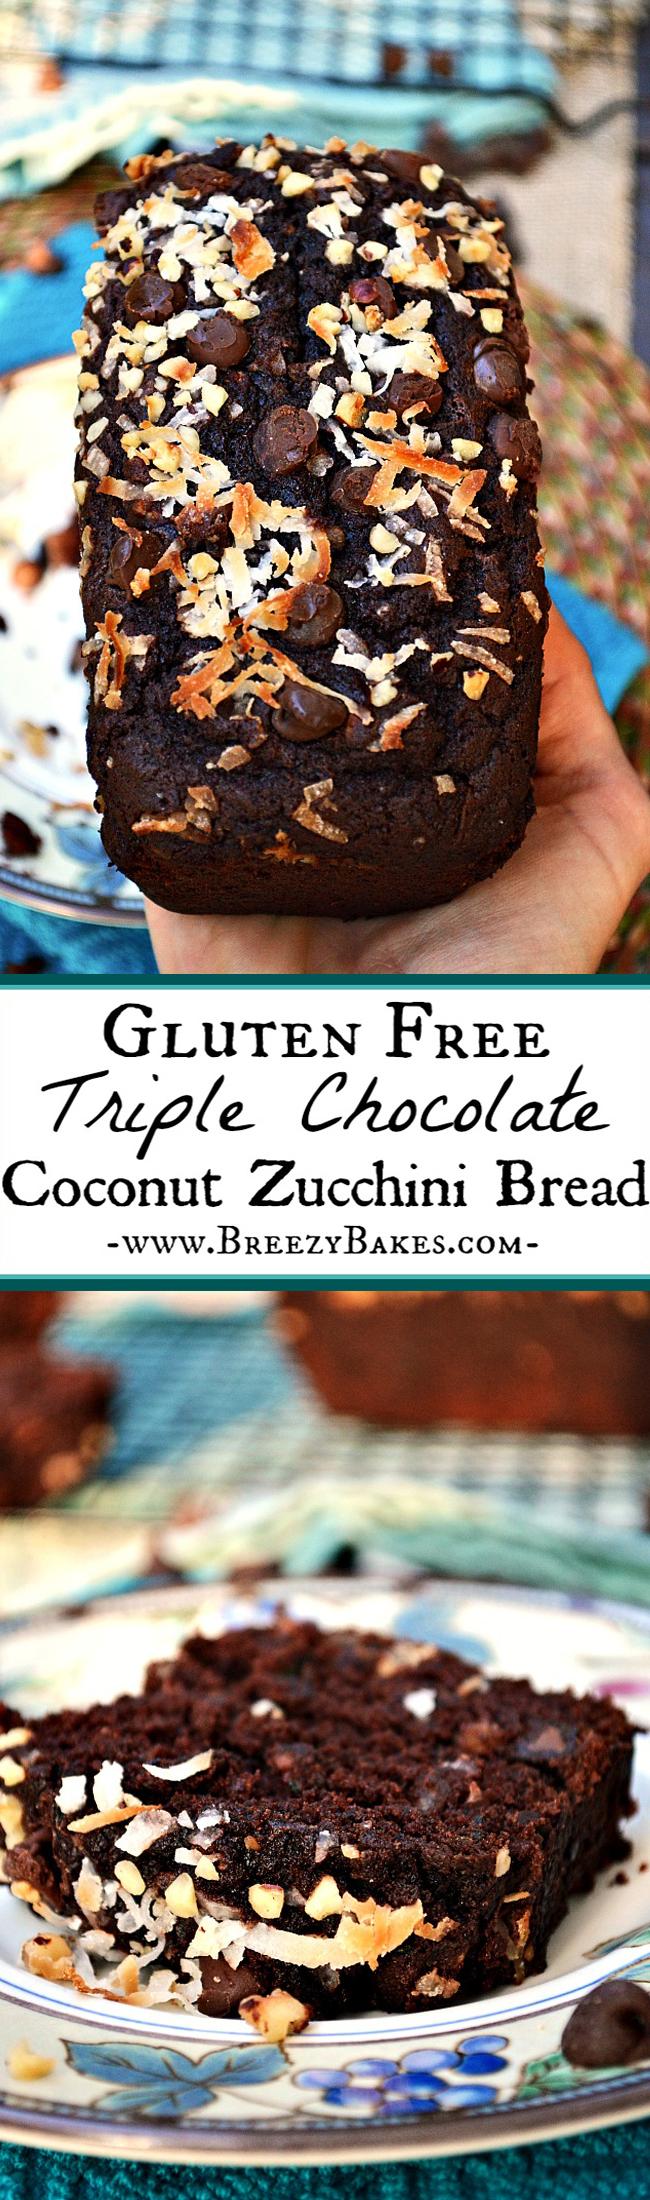 Gluten Free Chocolate Coconut Zucchini Bread - Breezy Bakes